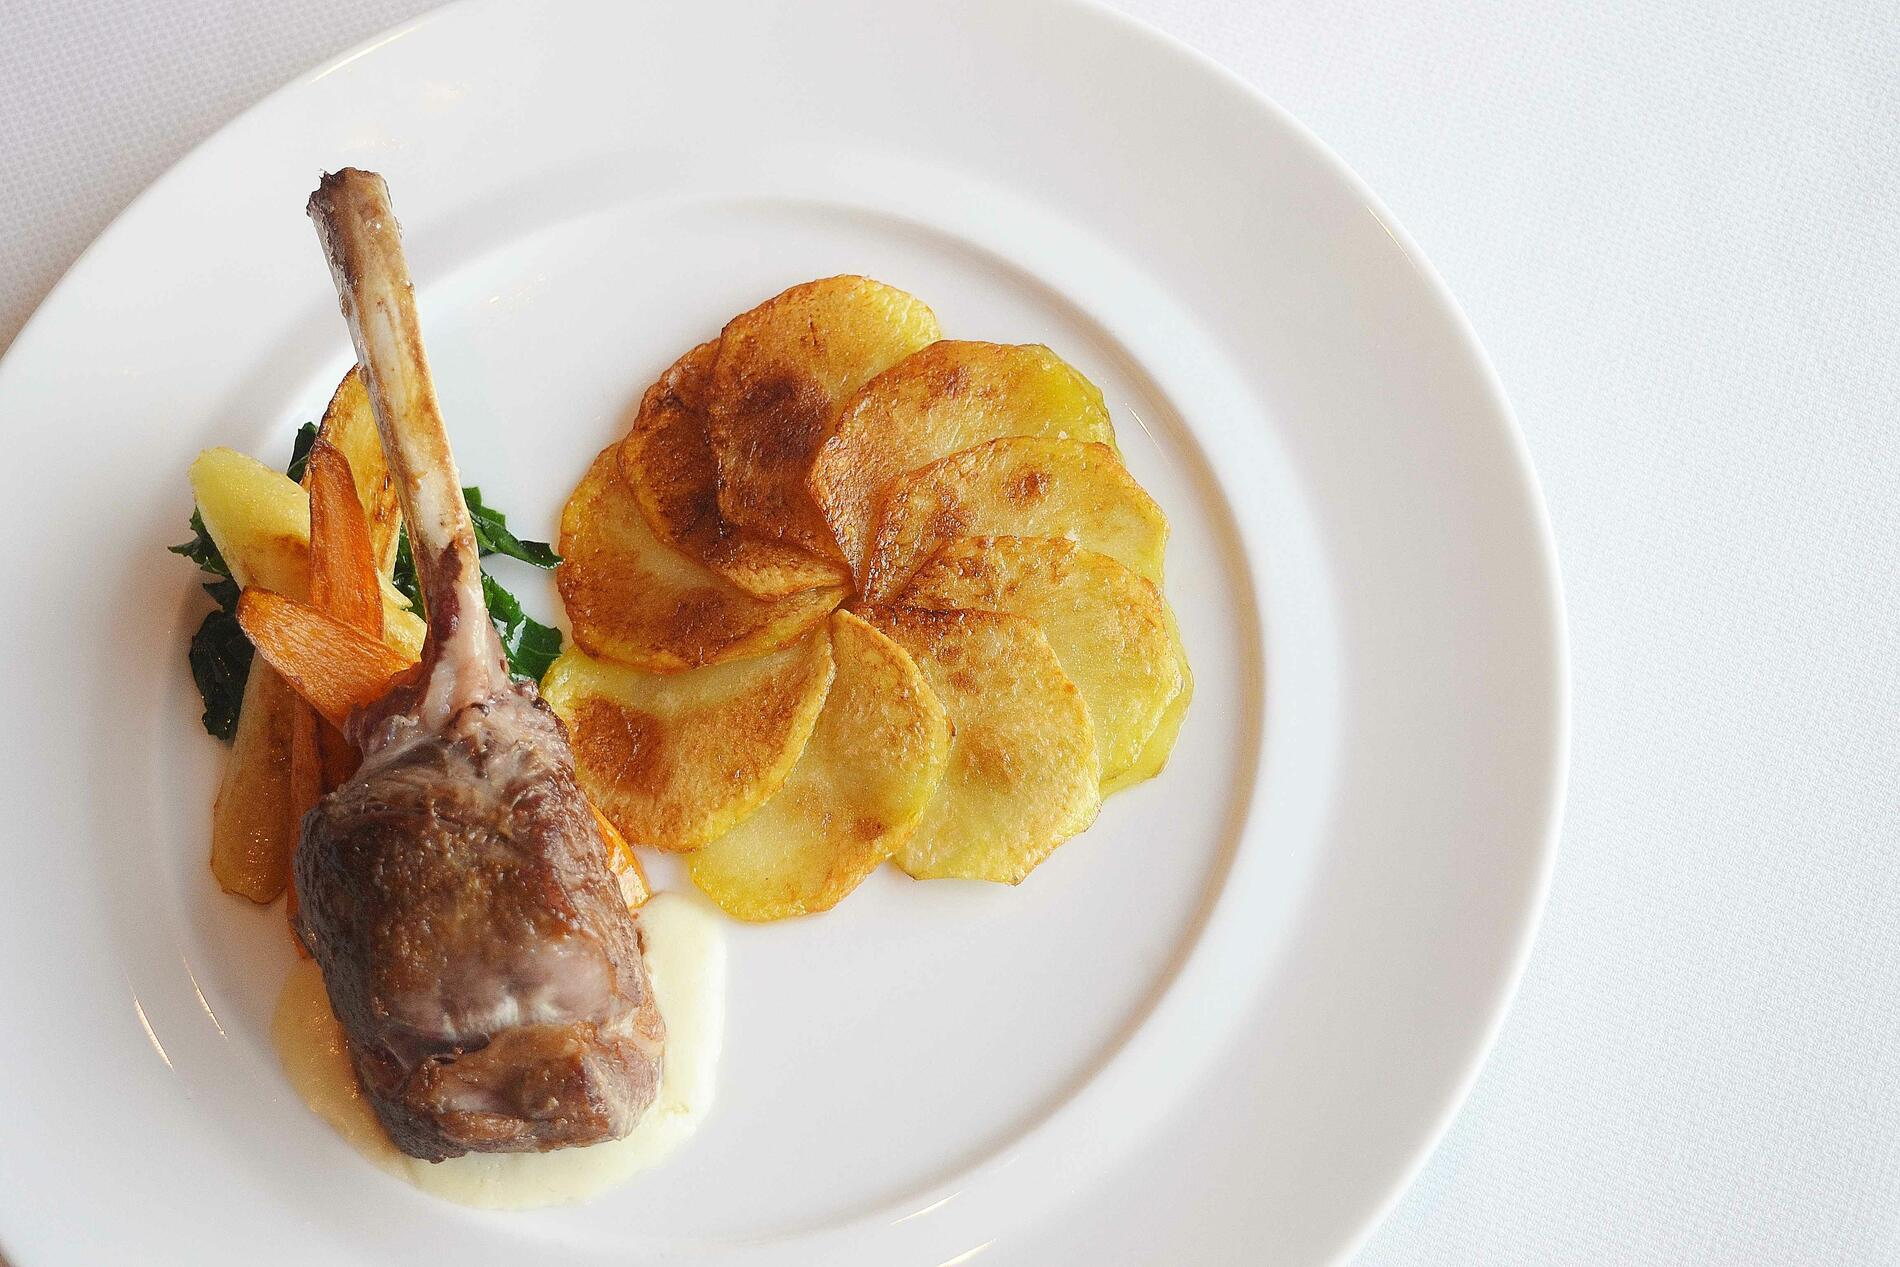 Lamb chop dish